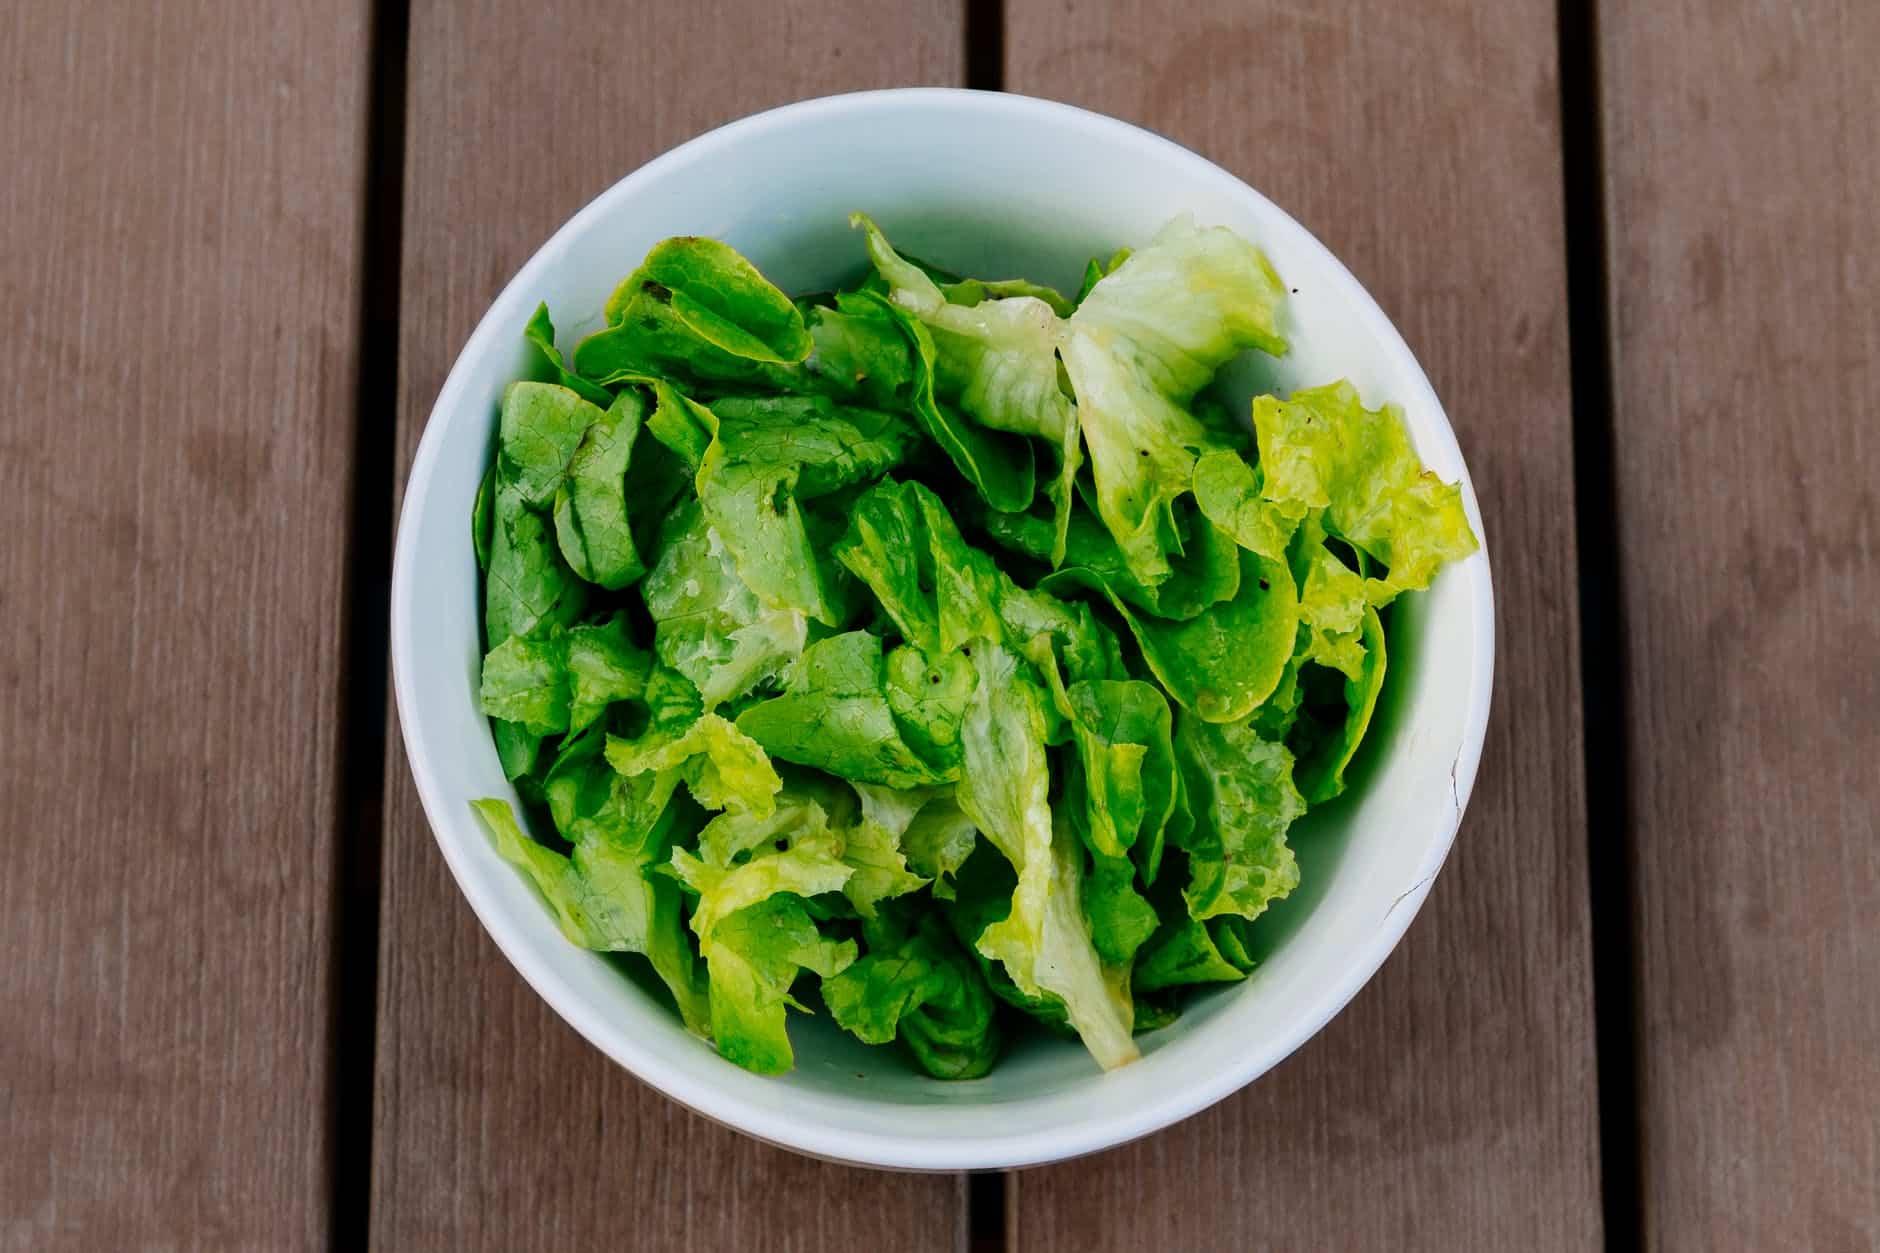 salade verte assiette laitue